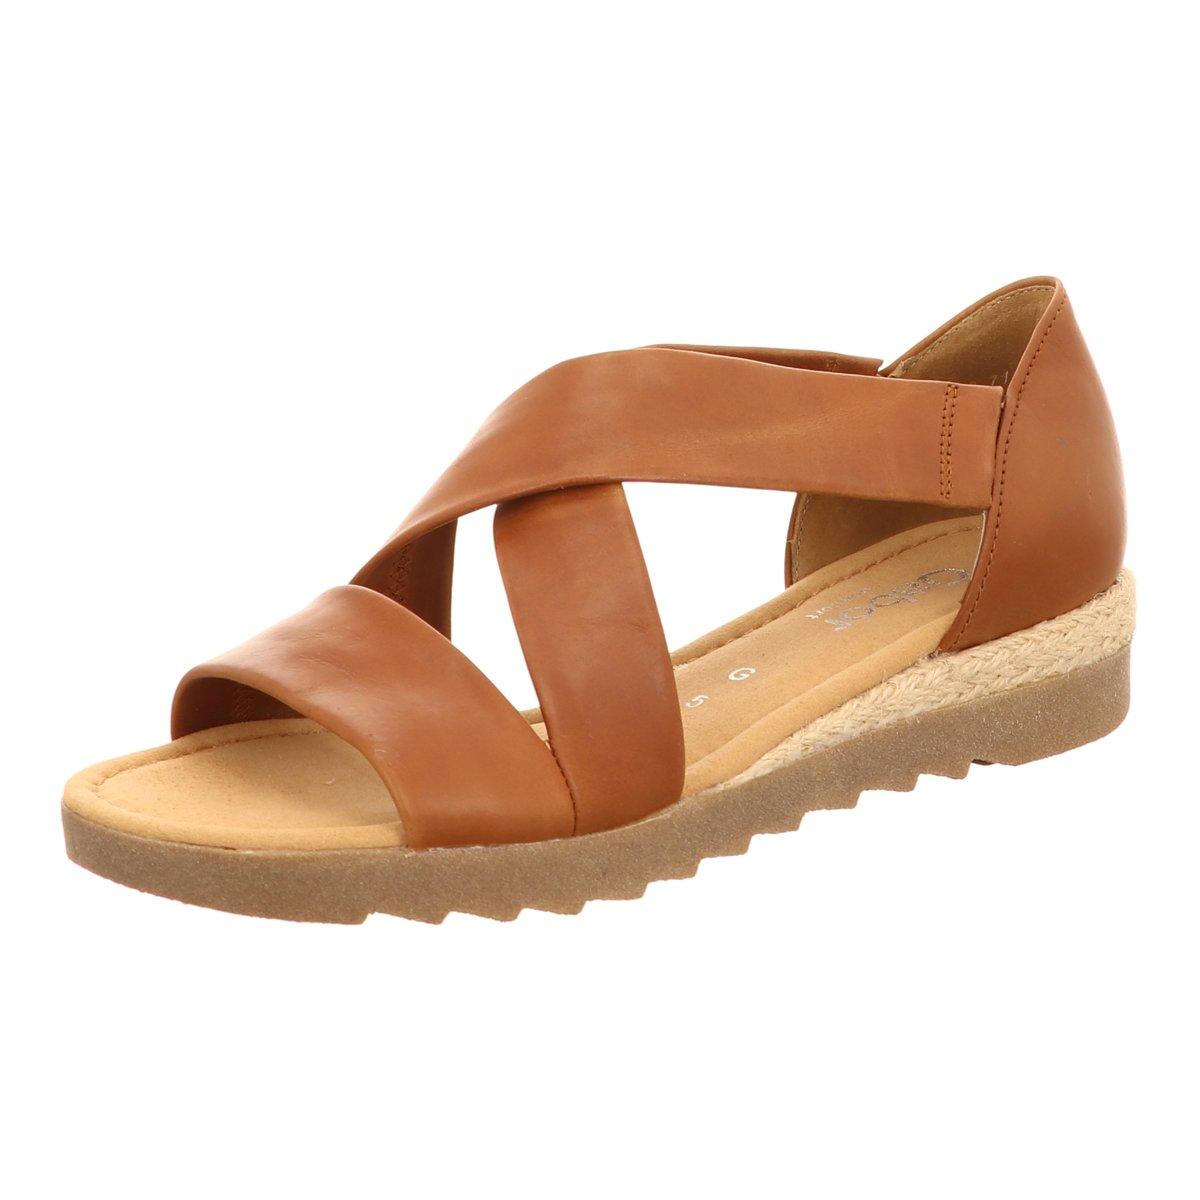 Gabor Comfort Damen Sandalette   Sandalen   Schuhe   Damen